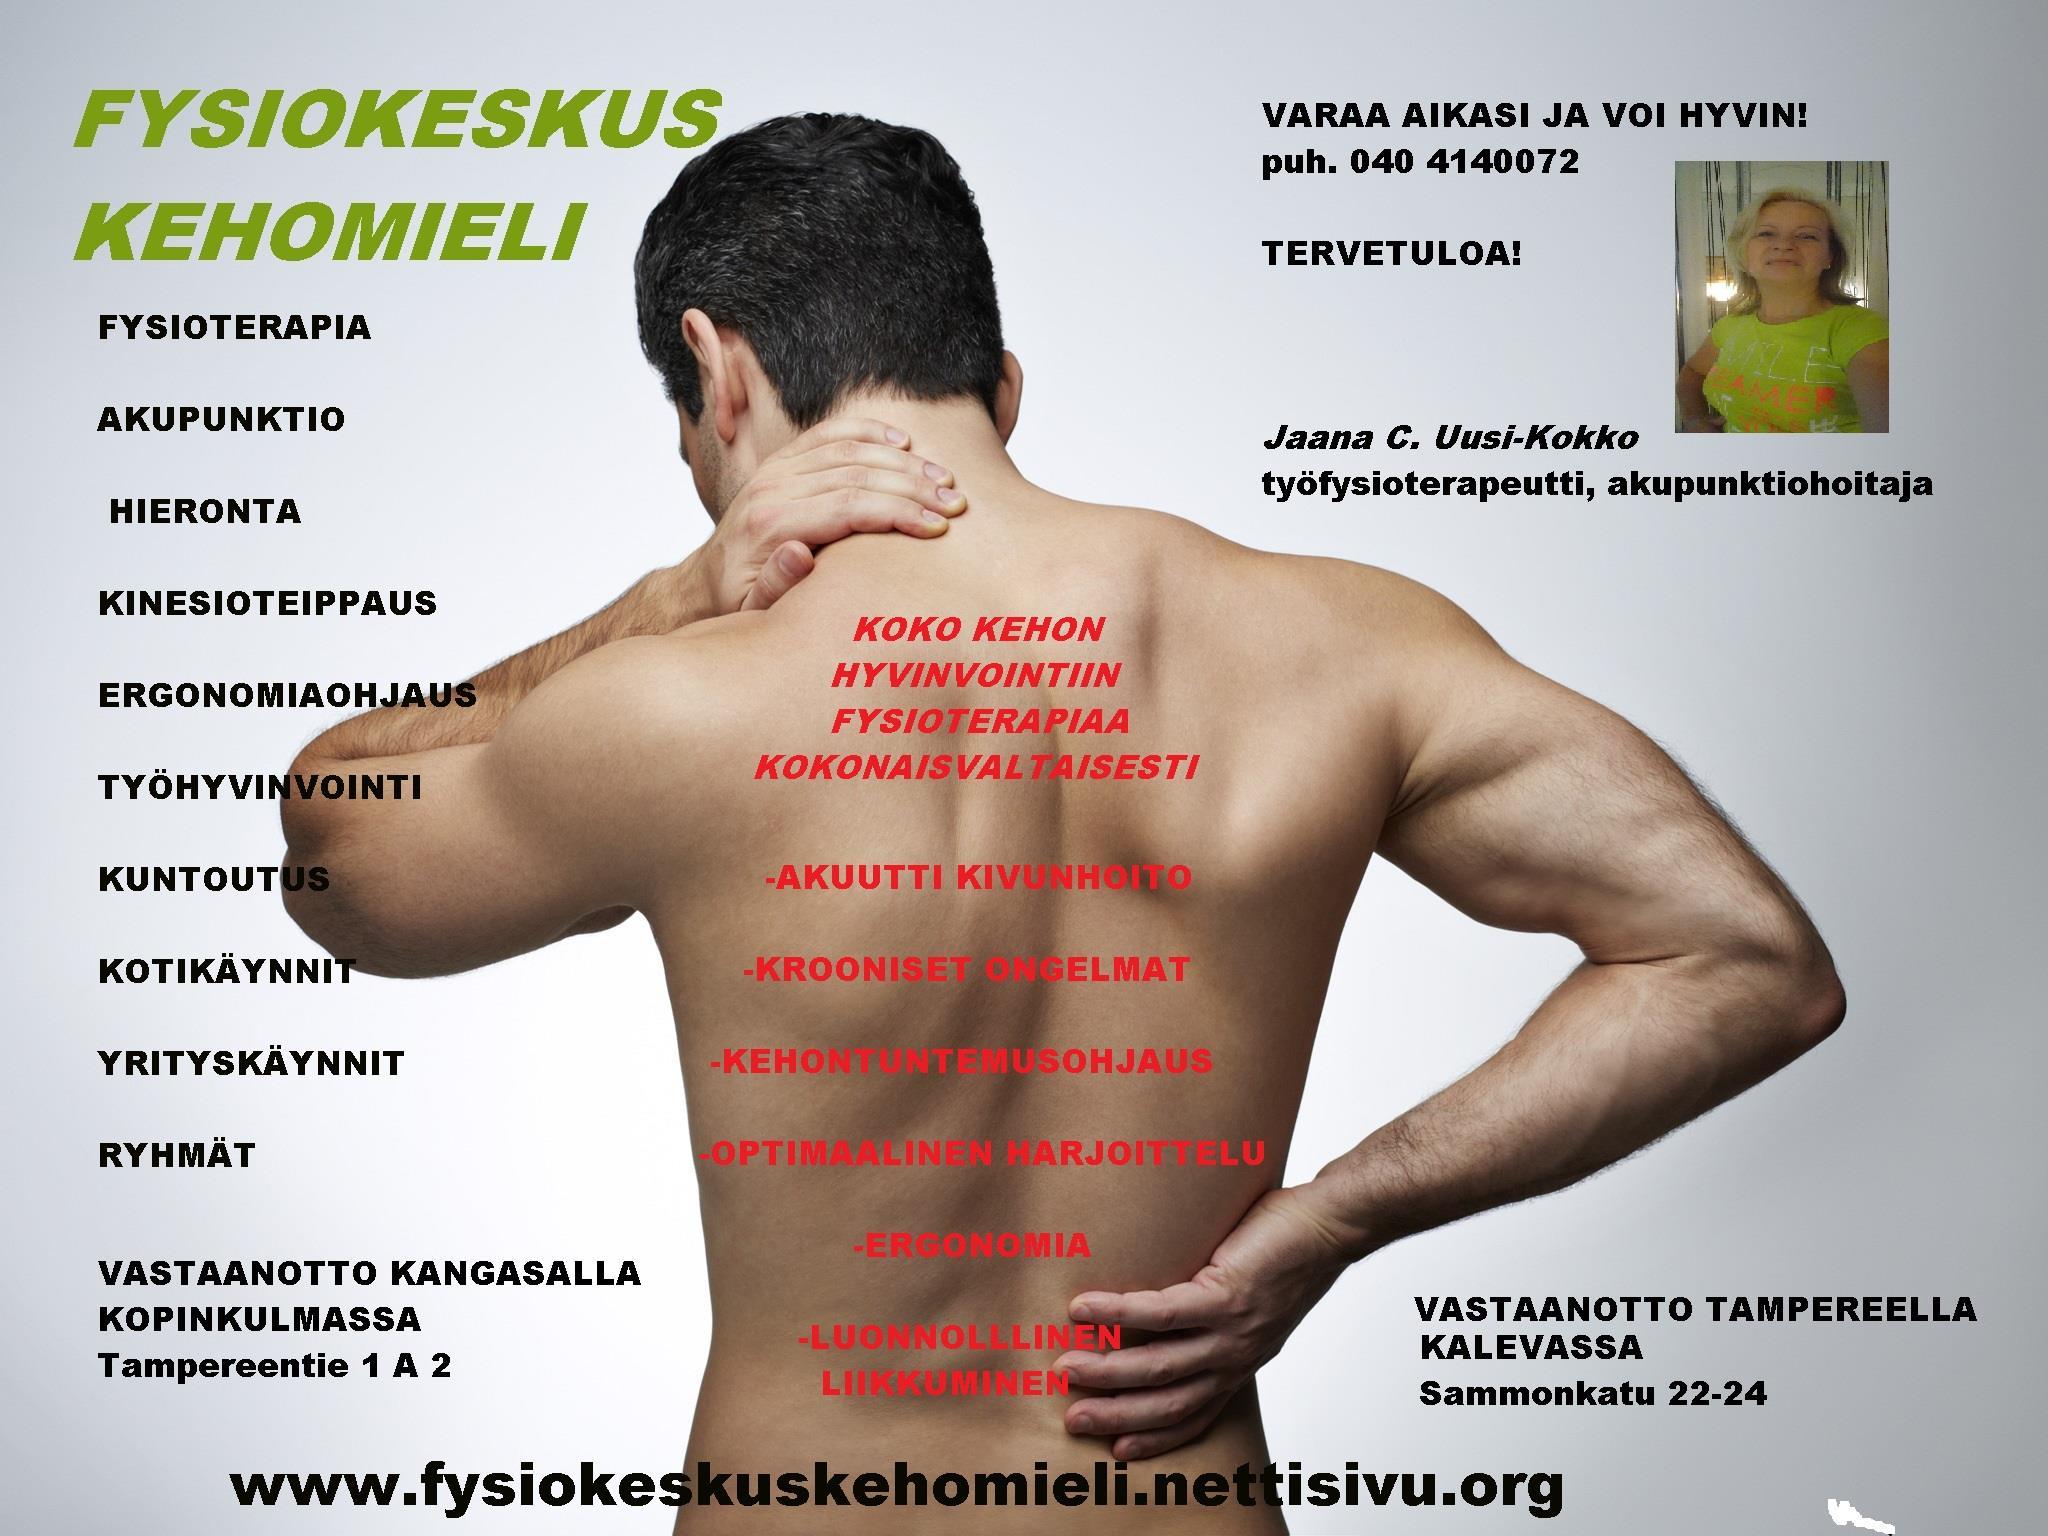 kehomieli_mainos_mieskeho_2015